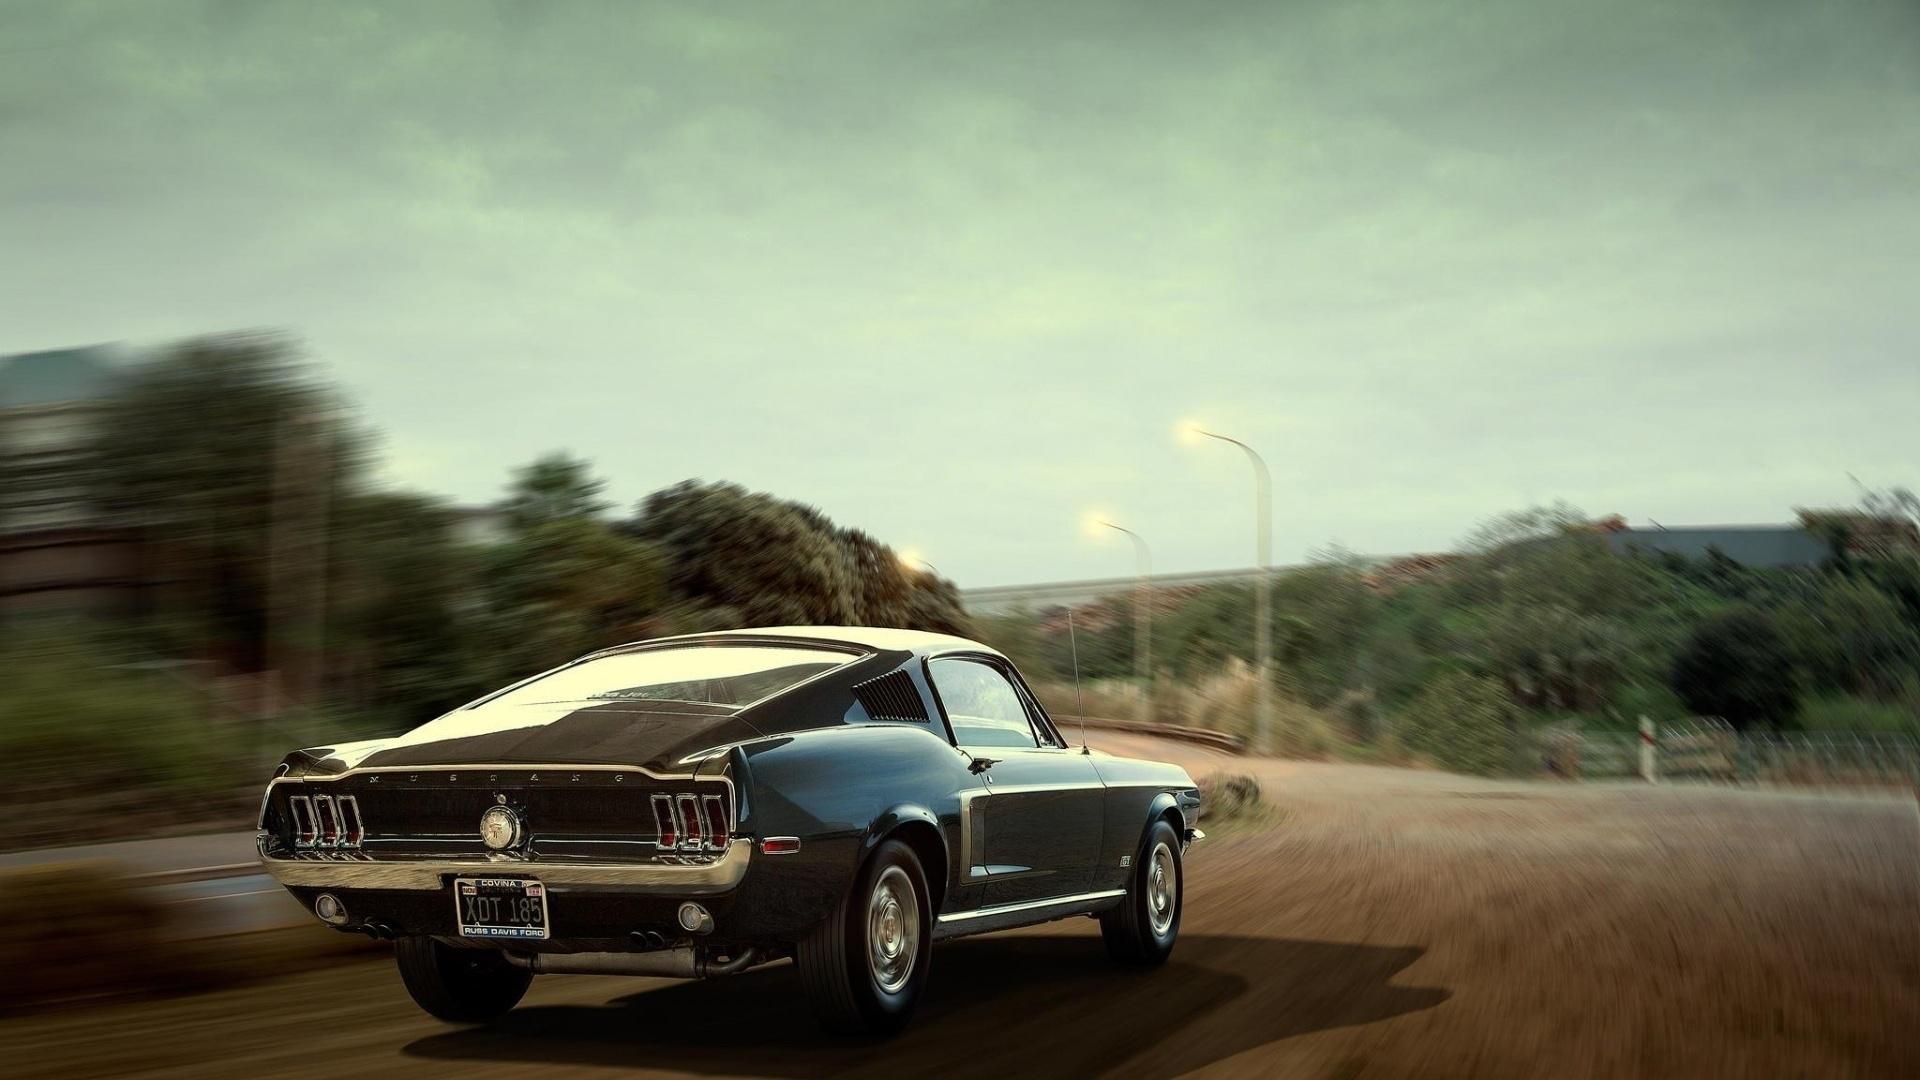 форд, мустанг, дорога, скорость